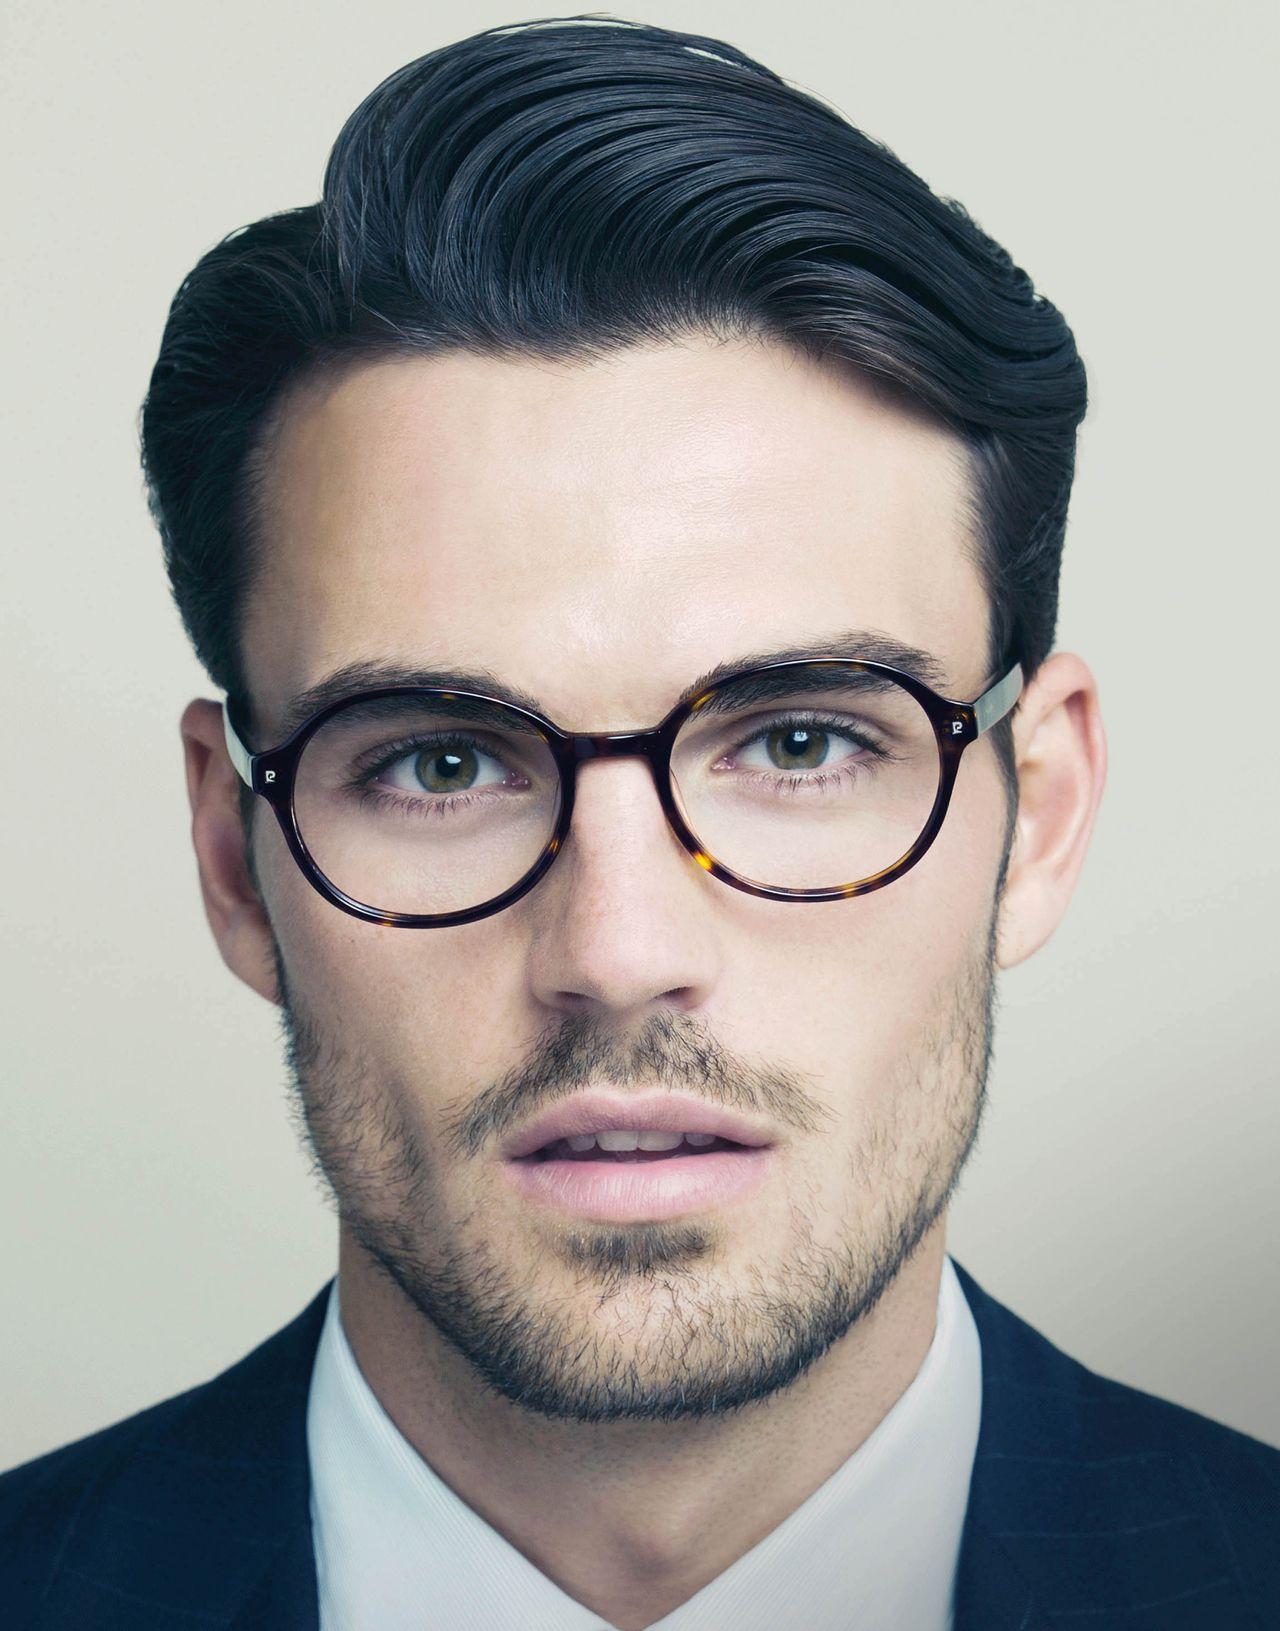 moda-masculina-lentes-cara-hombre-carametria-caramorfoligia-consultoria-de-imagen.jpg (1280×1631)